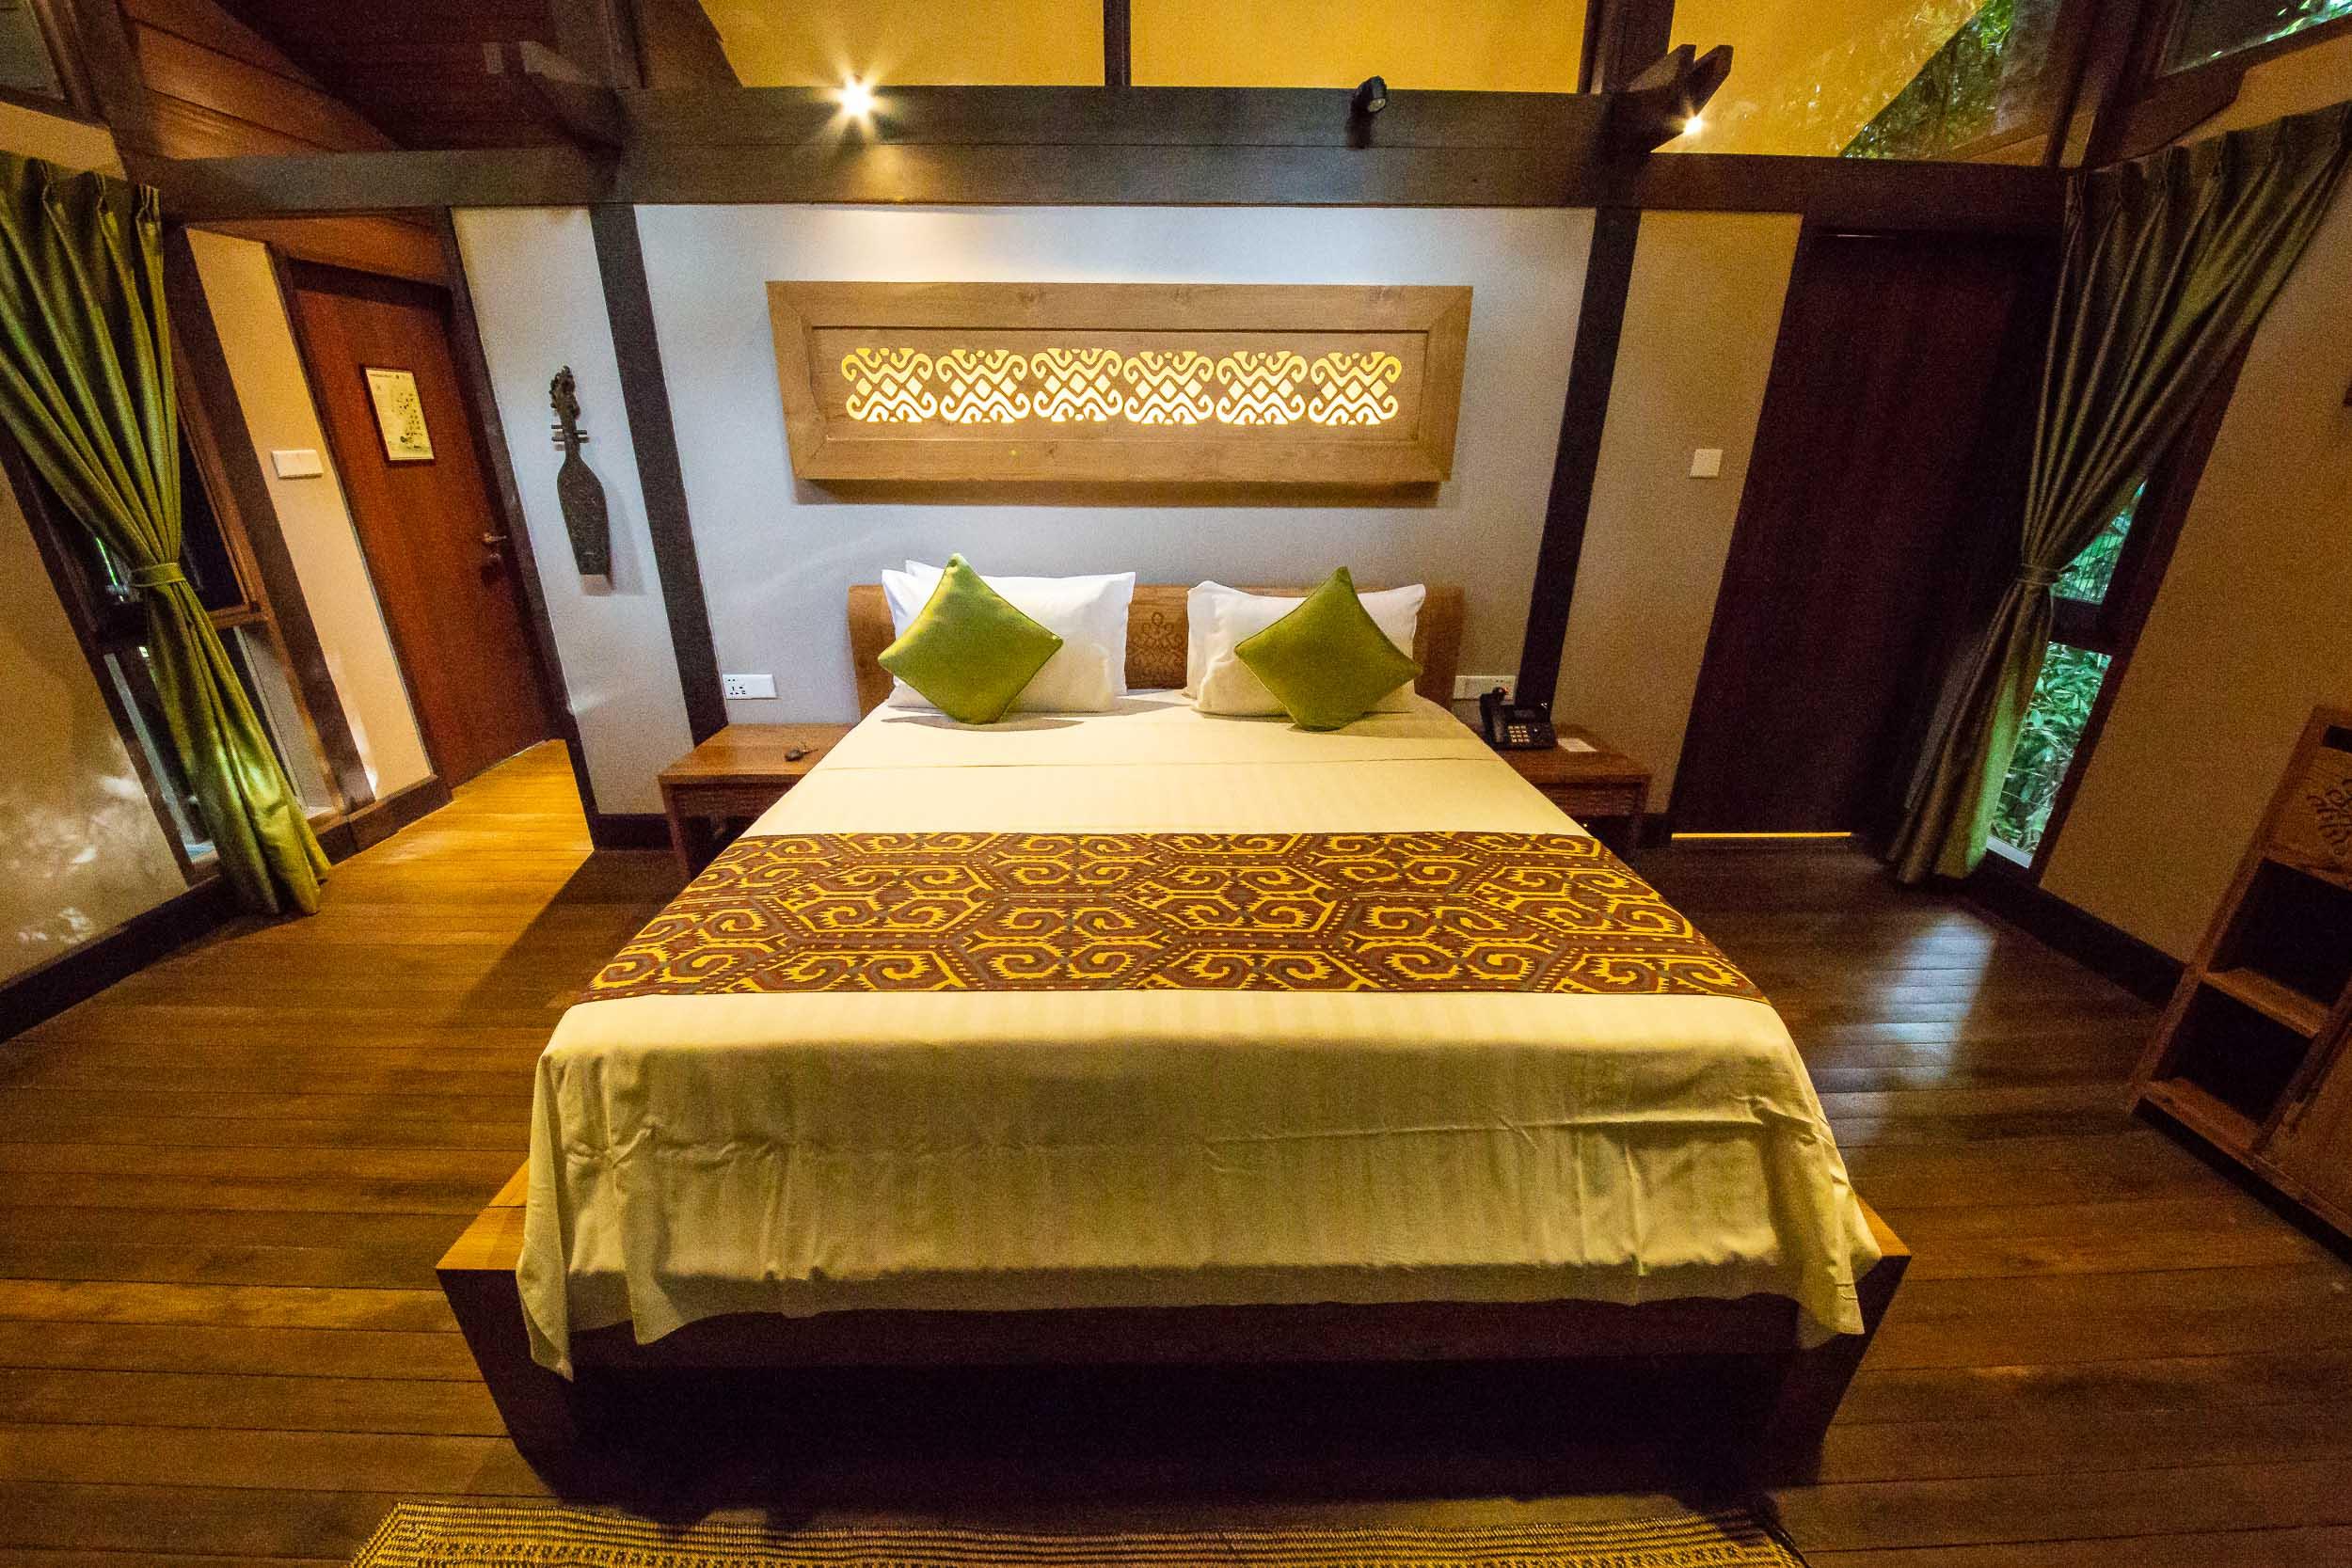 Queen Bed, Villa Room, Sukau Rainforest Lodge, Sabah, Borneo, Malaysia